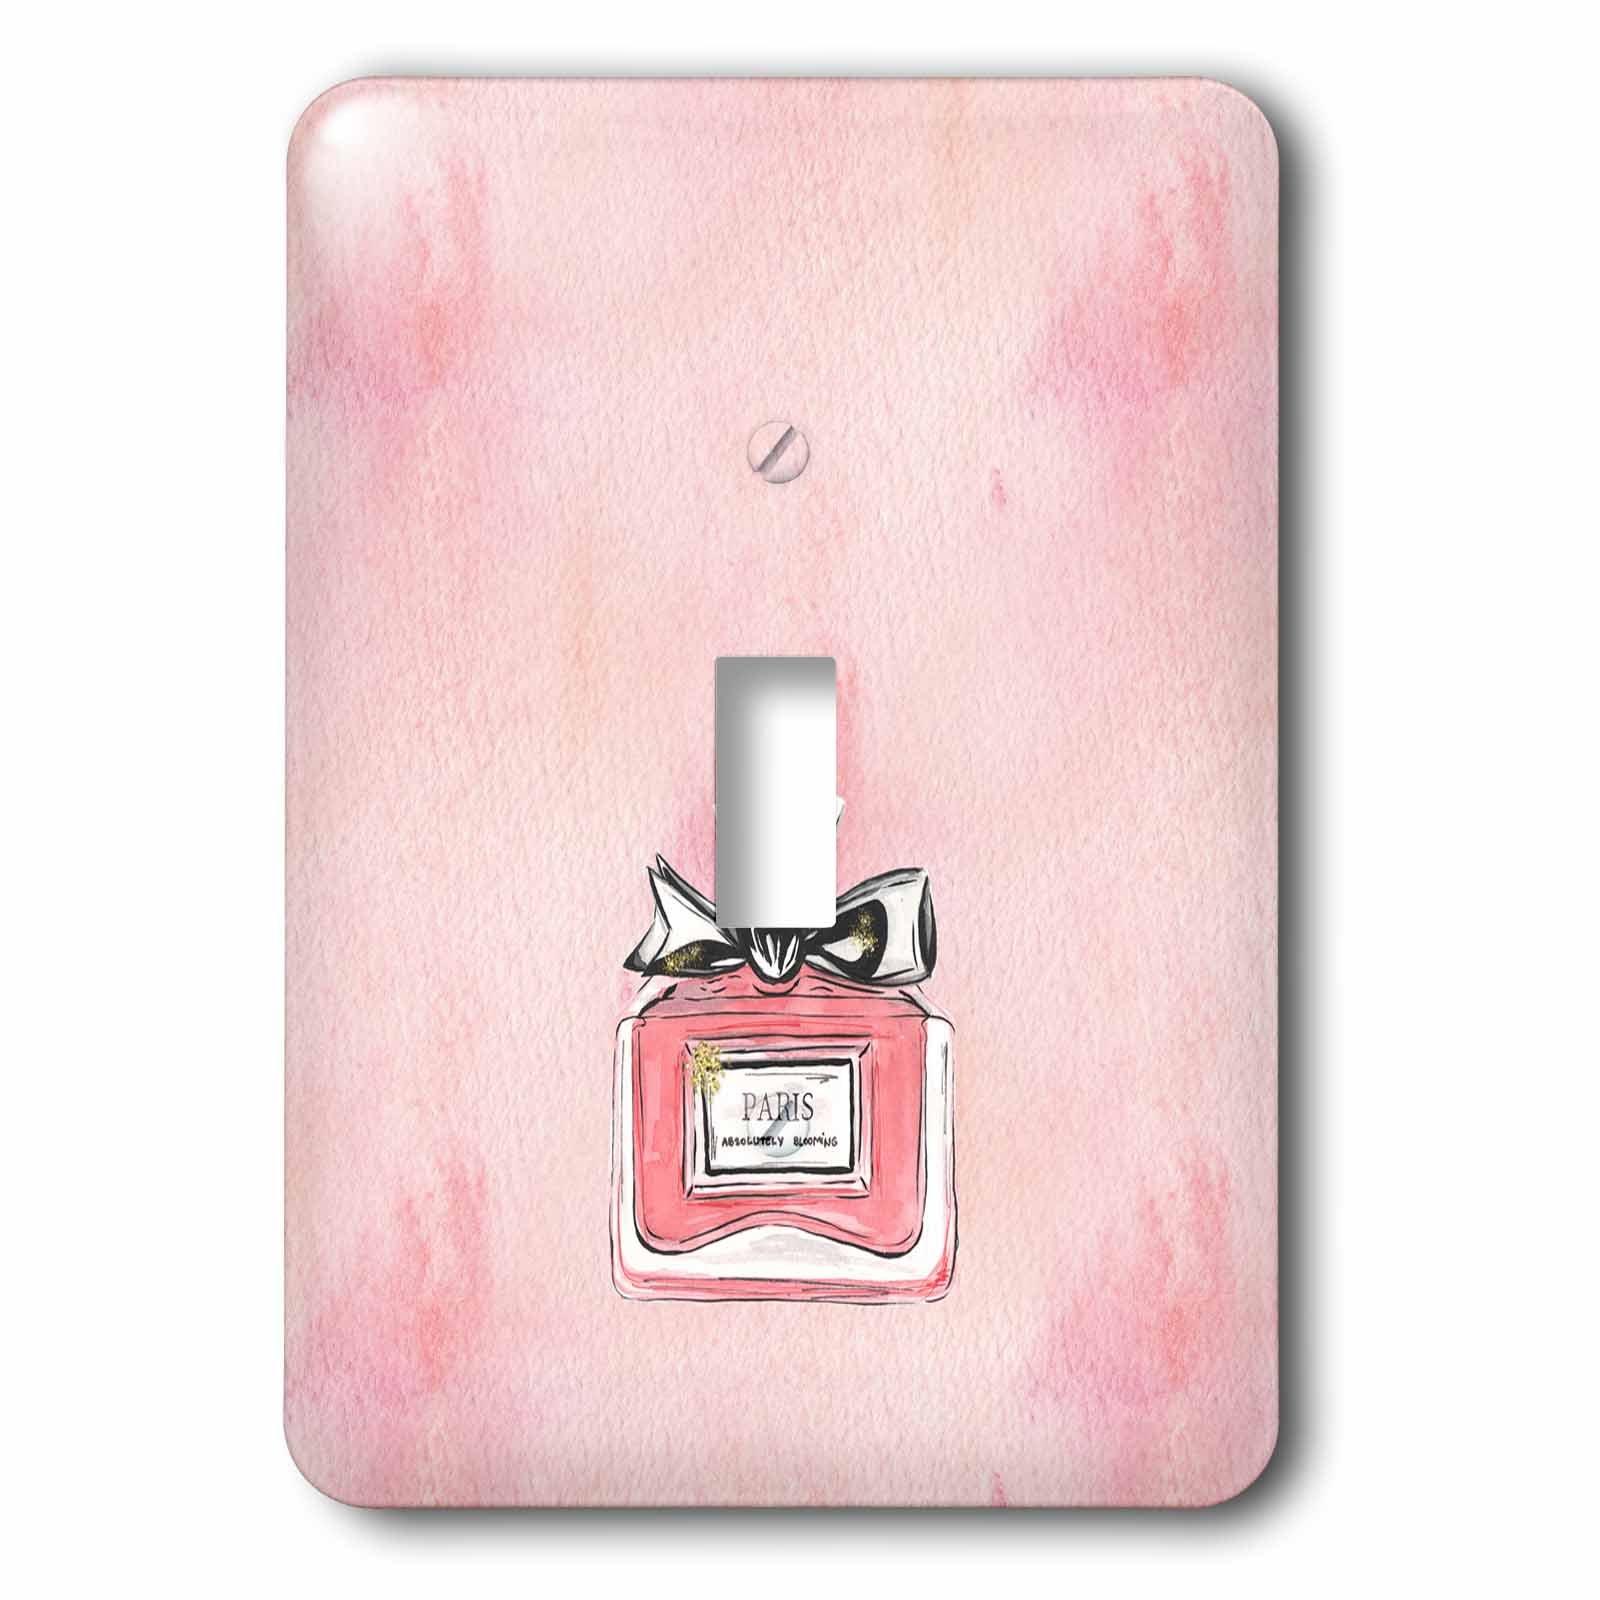 3dRose Uta Naumann Watercolor Illustration - Pink Luxury Girly Chic Perfume Illustration on Grunge Pink - Light Switch Covers - single toggle switch (lsp_267033_1)